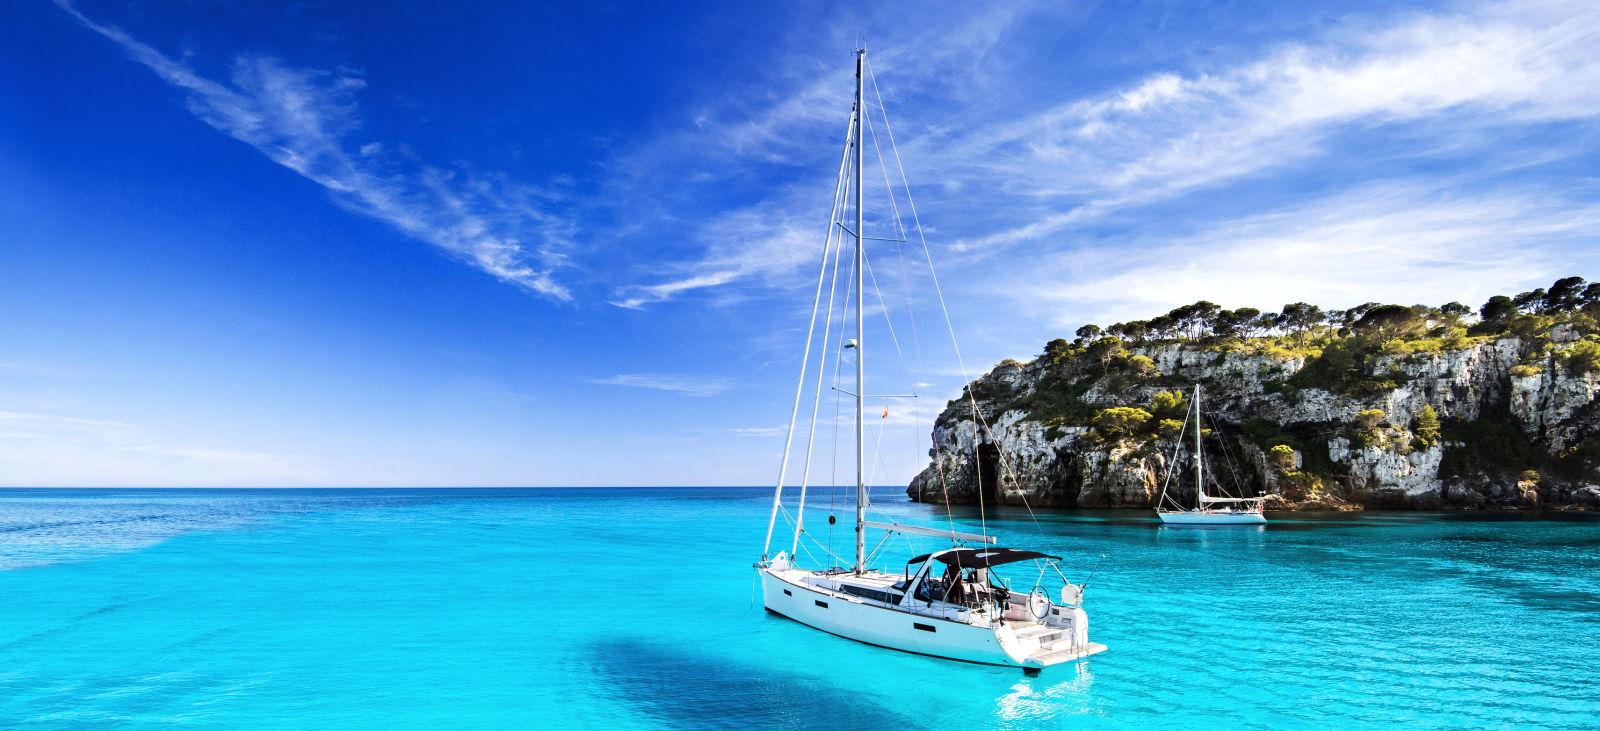 Balearic Islands, Europe, Mahón